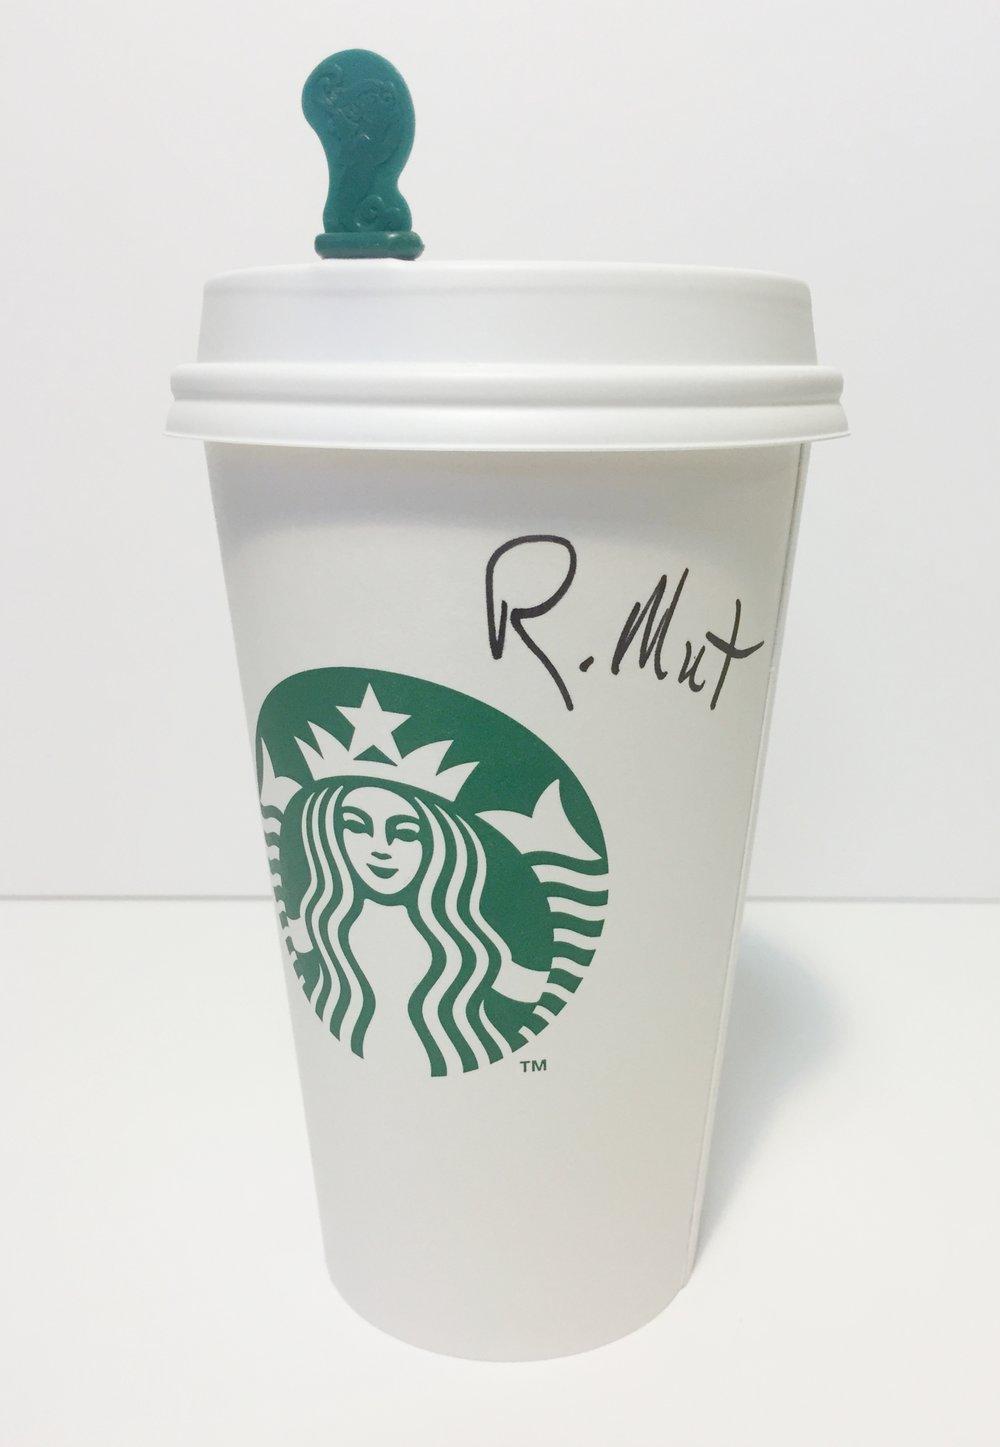 R. Mut (PSL)